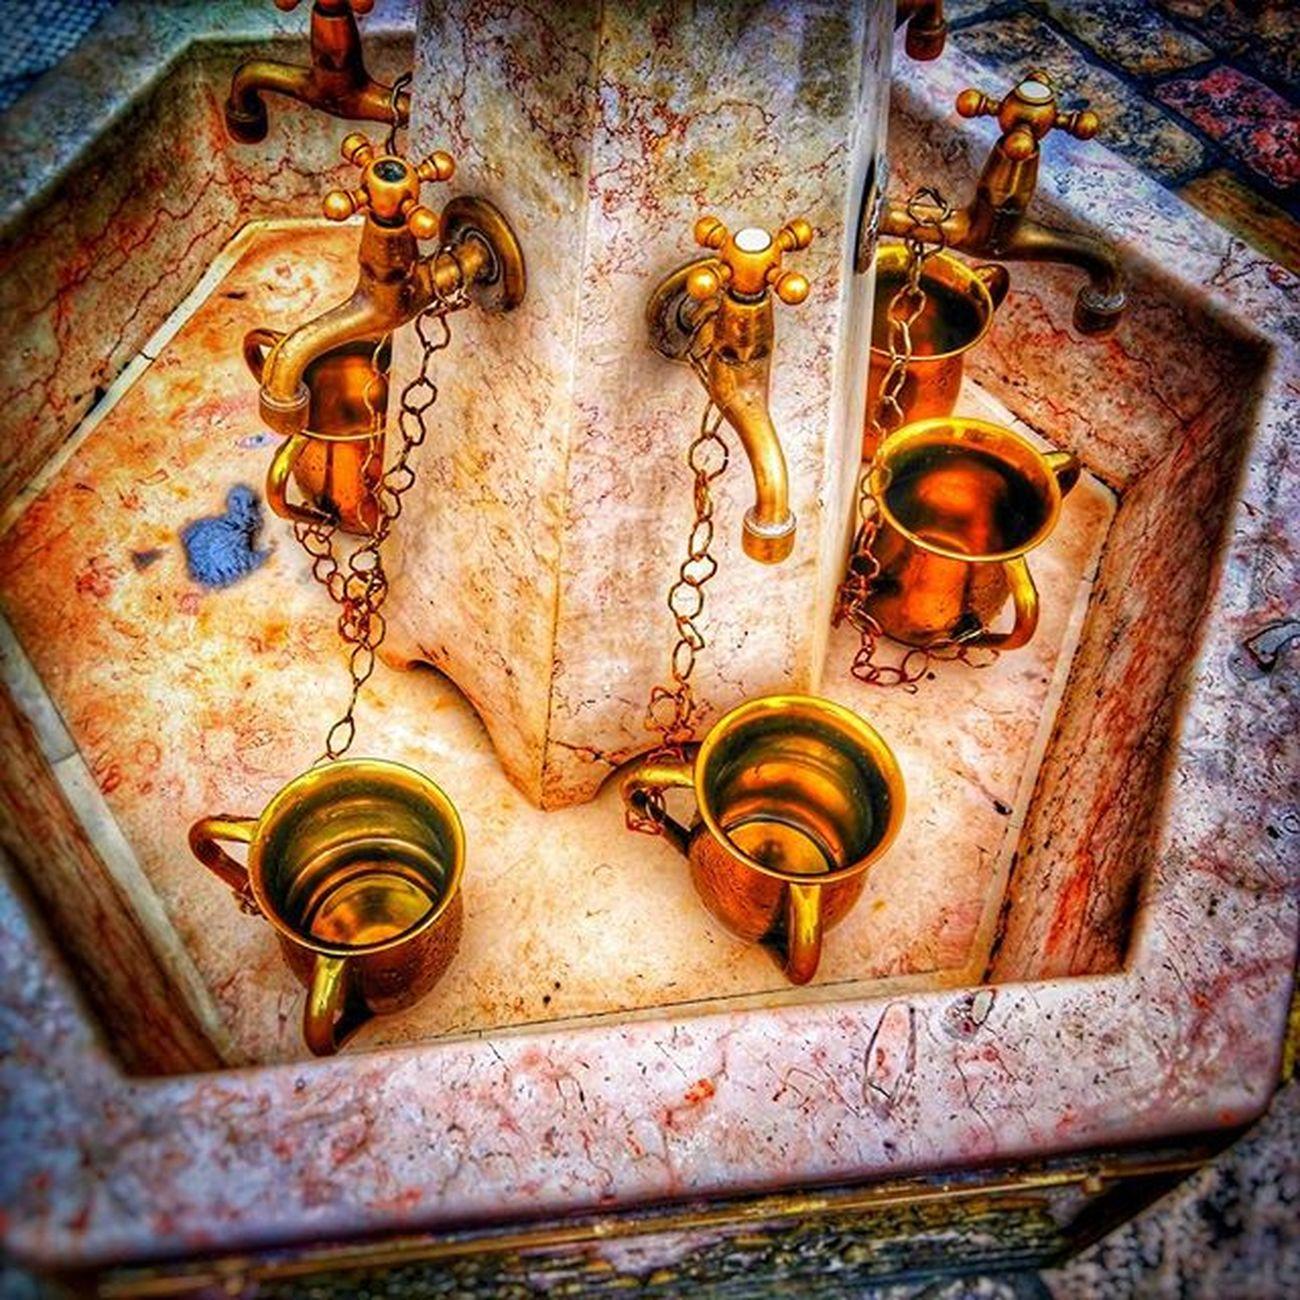 Hand washing station at Westernwall Wailingwall in Jerusalem Jewishquarter Jewish Israel